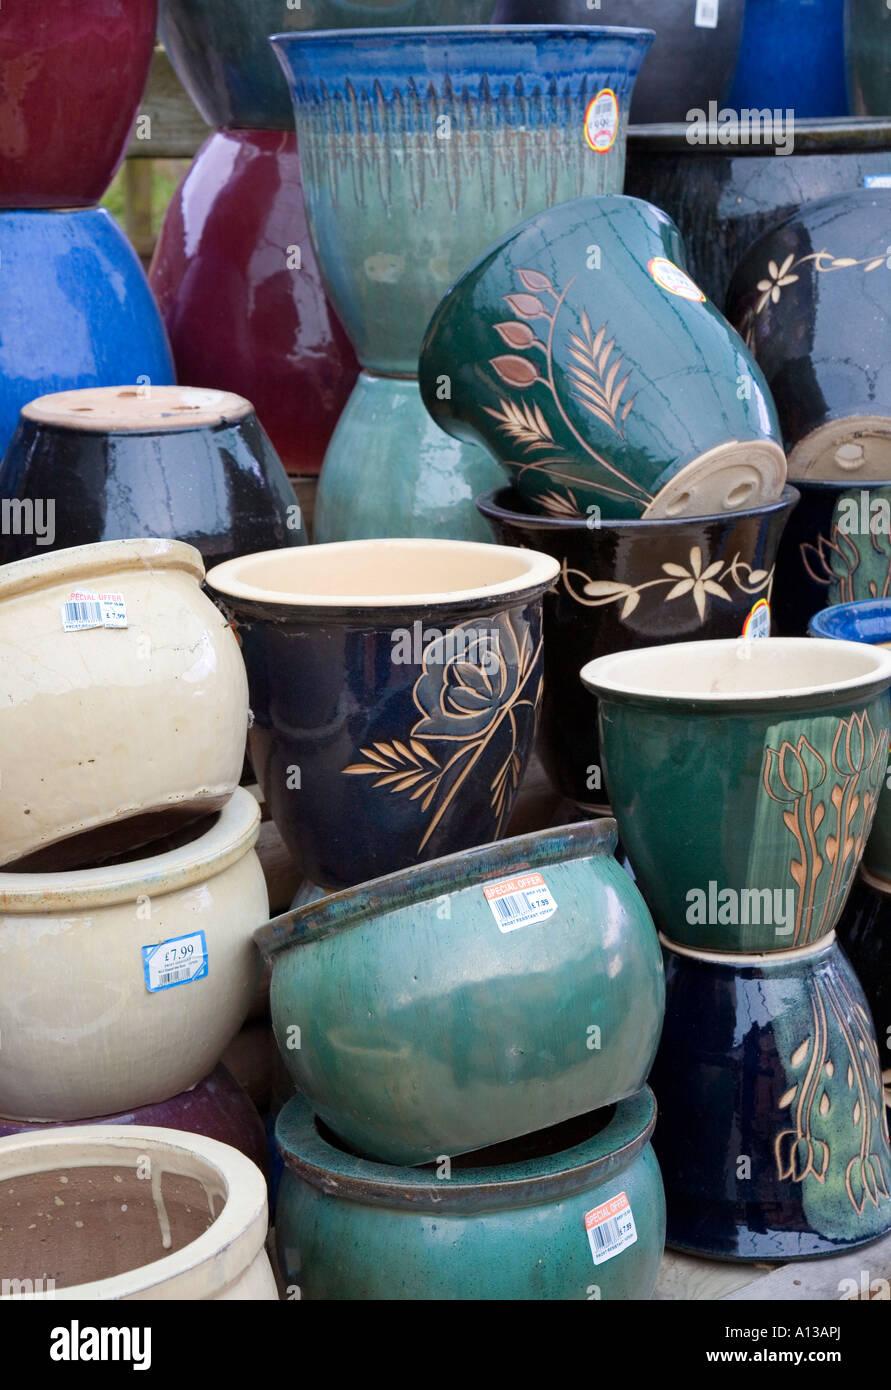 Wonderful Ceramic Pots For Sale Part - 11: Frost Resistant Ceramic Pots On Sale In Garden Centre UK